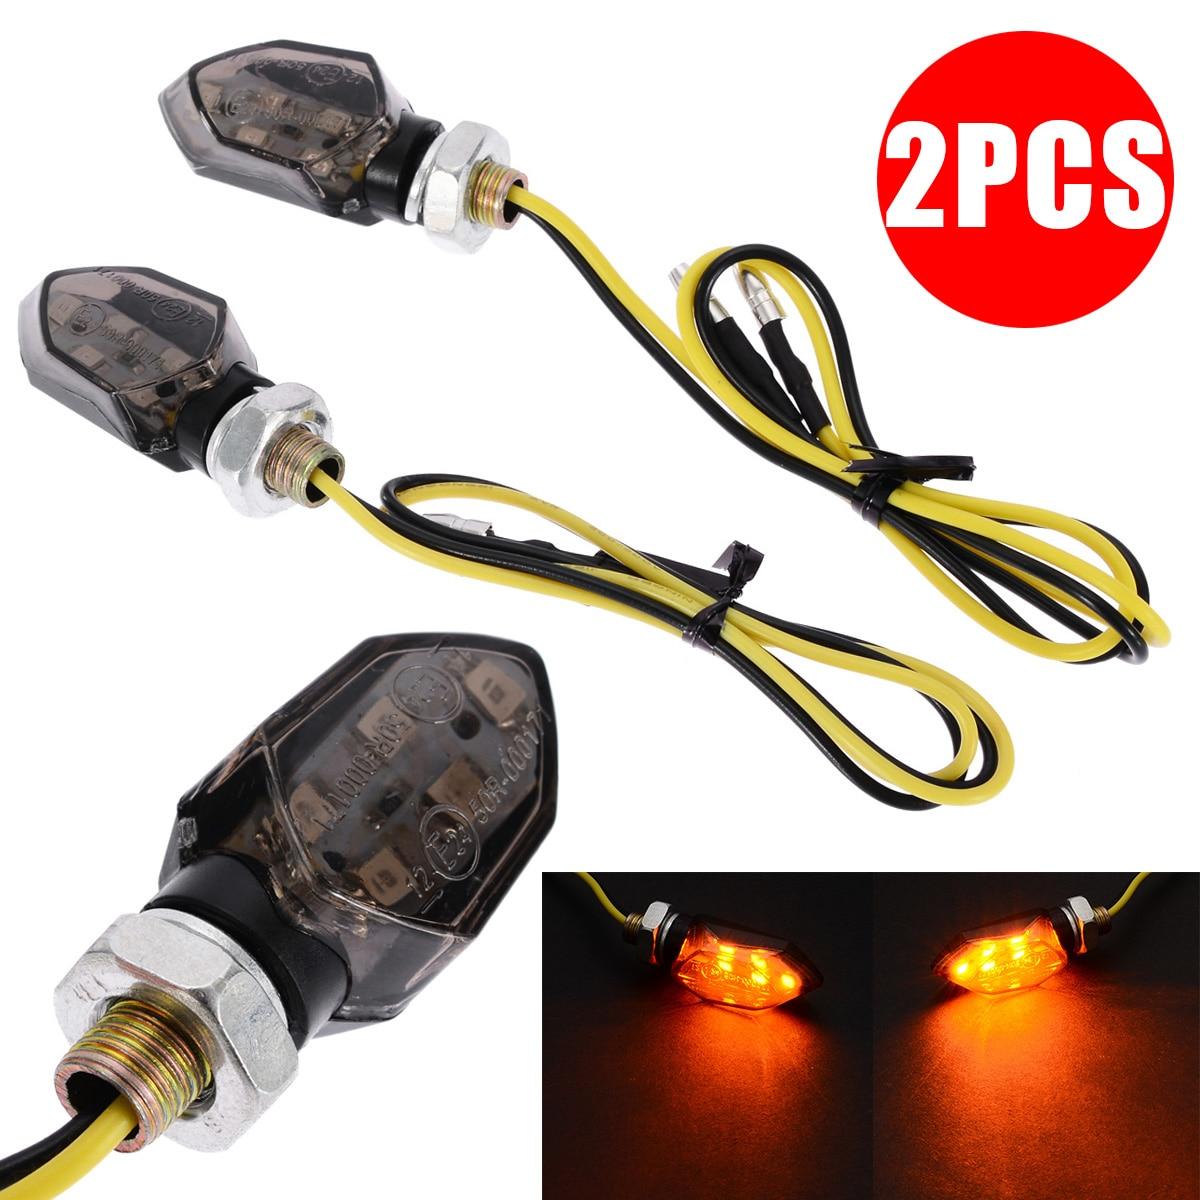 2pcs 12V Mini Motorcycle 5LED Amber Turn Signal Indicator Light Blinker ABS Plastic Housing Integrated PC Smoke Lens